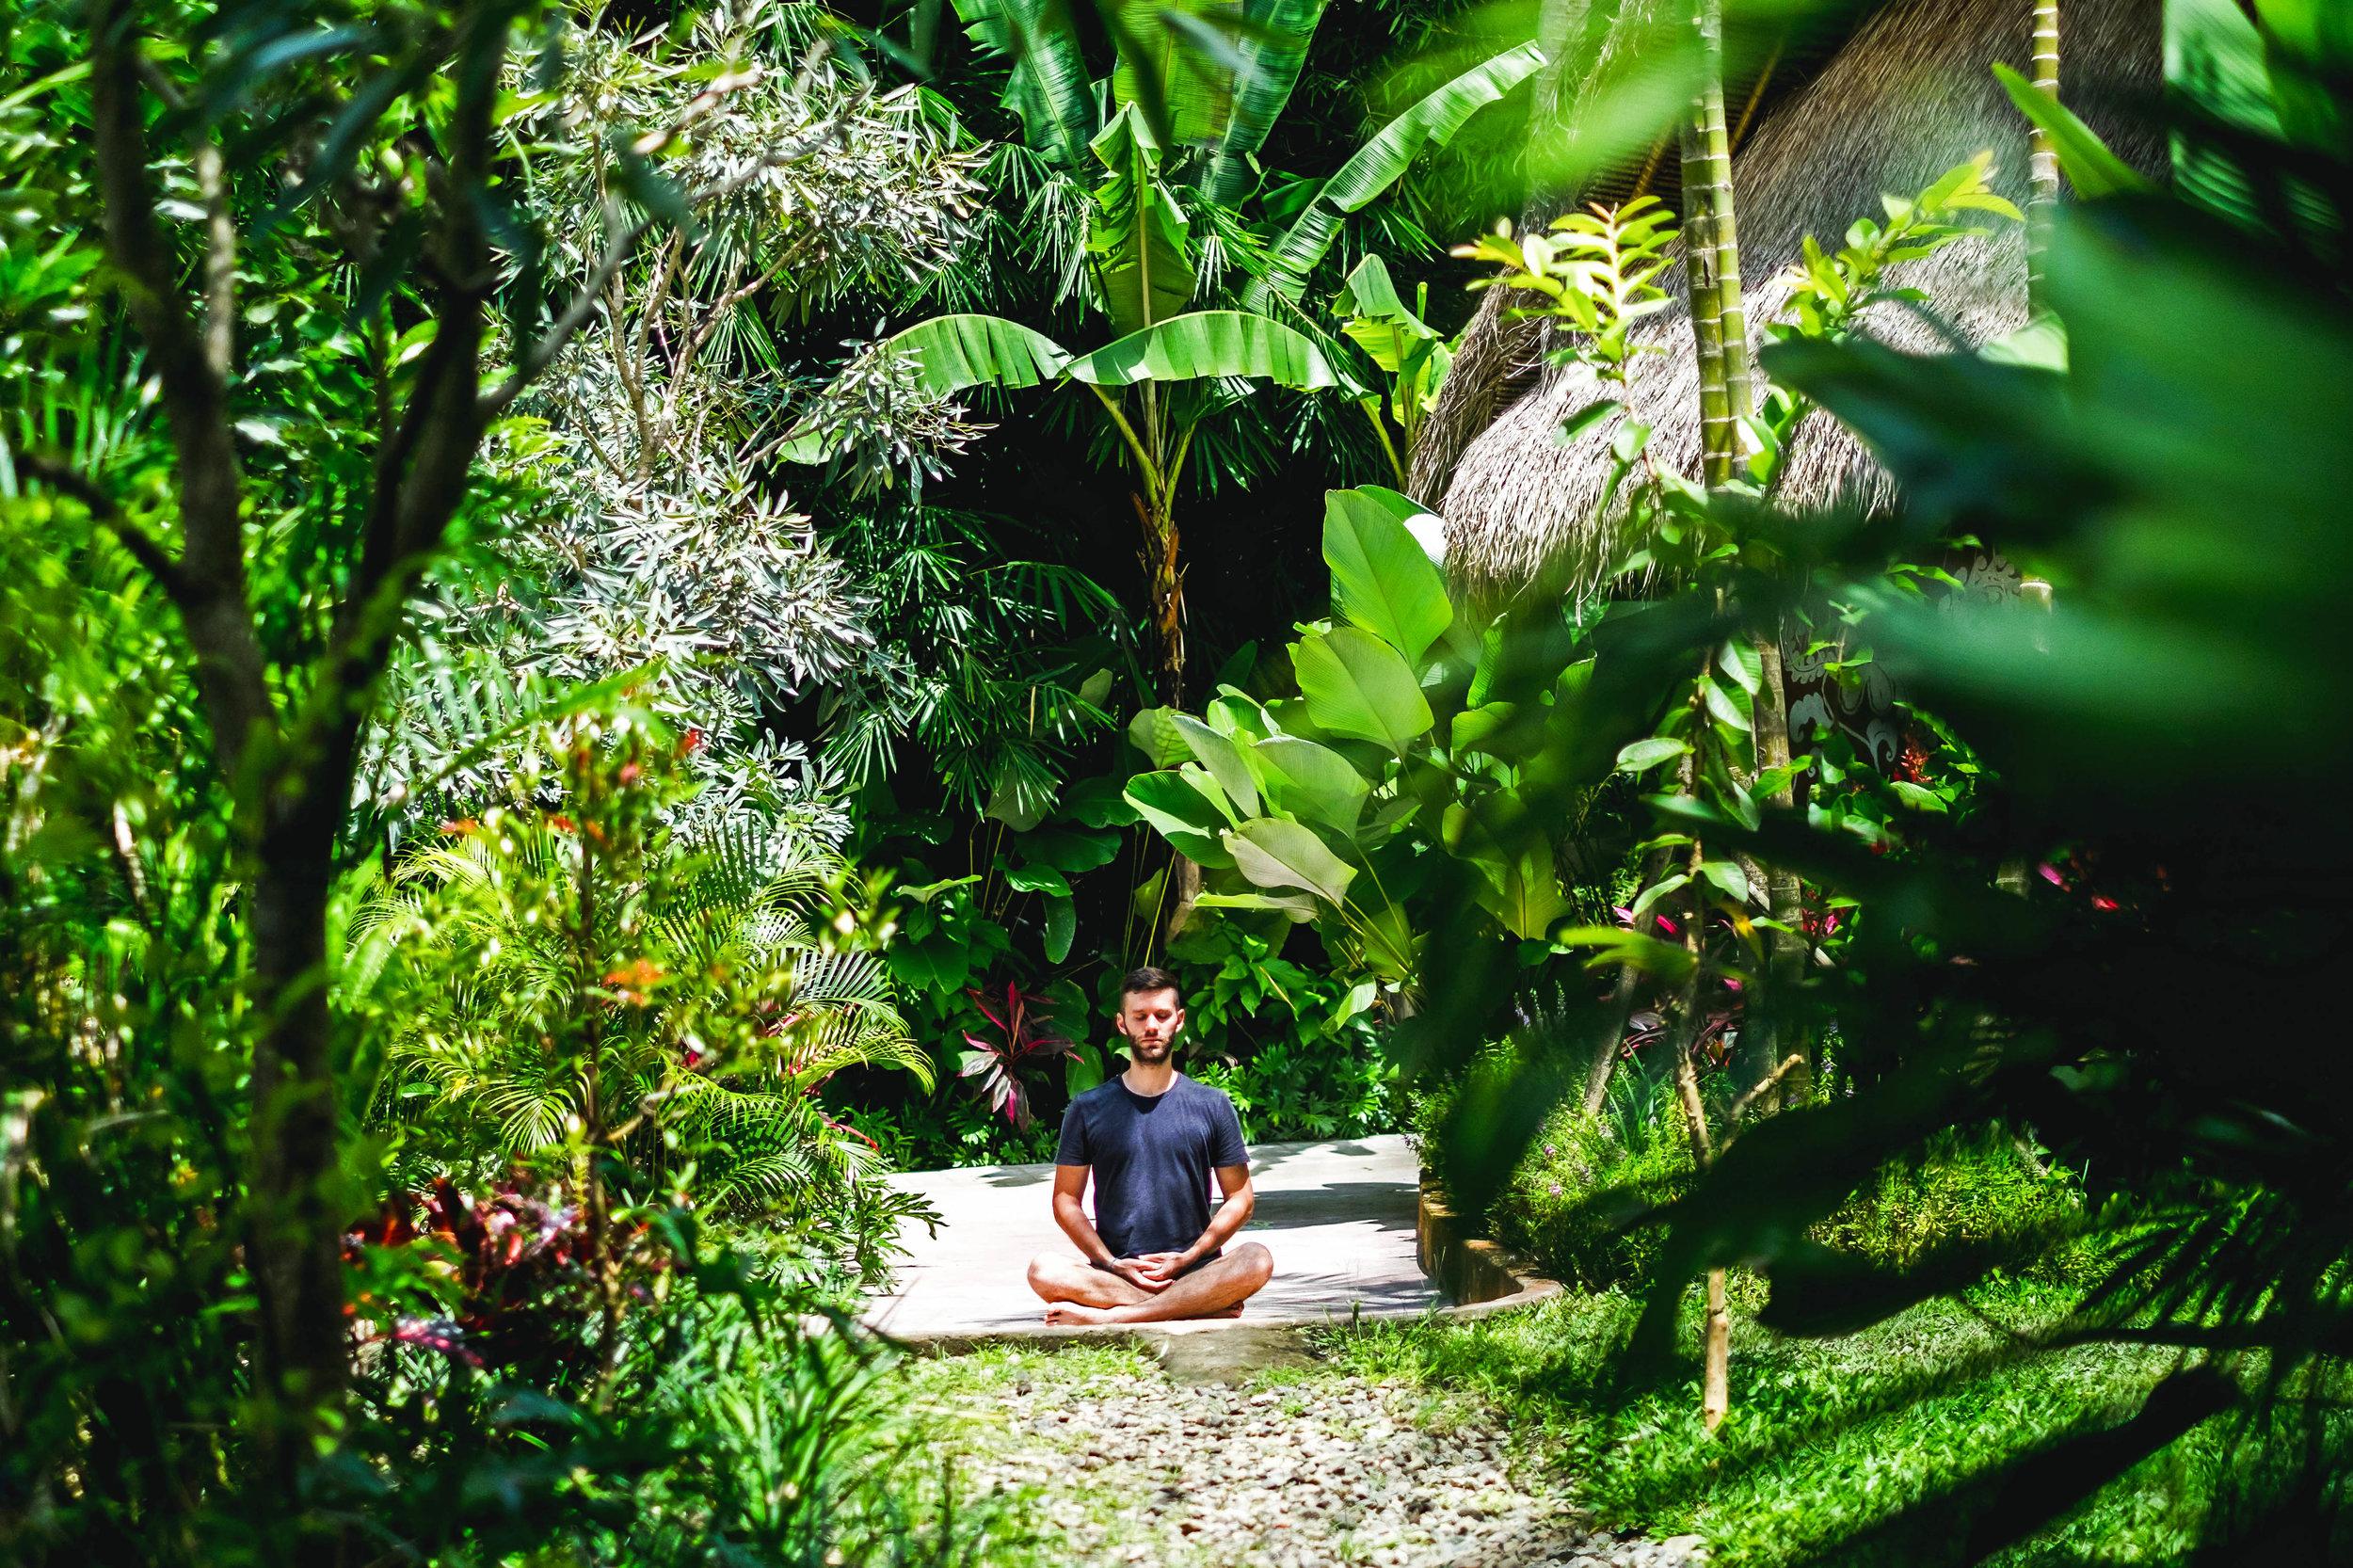 Paul-Kovalski-The-Yoga-Barn-Ubud-19.jpg